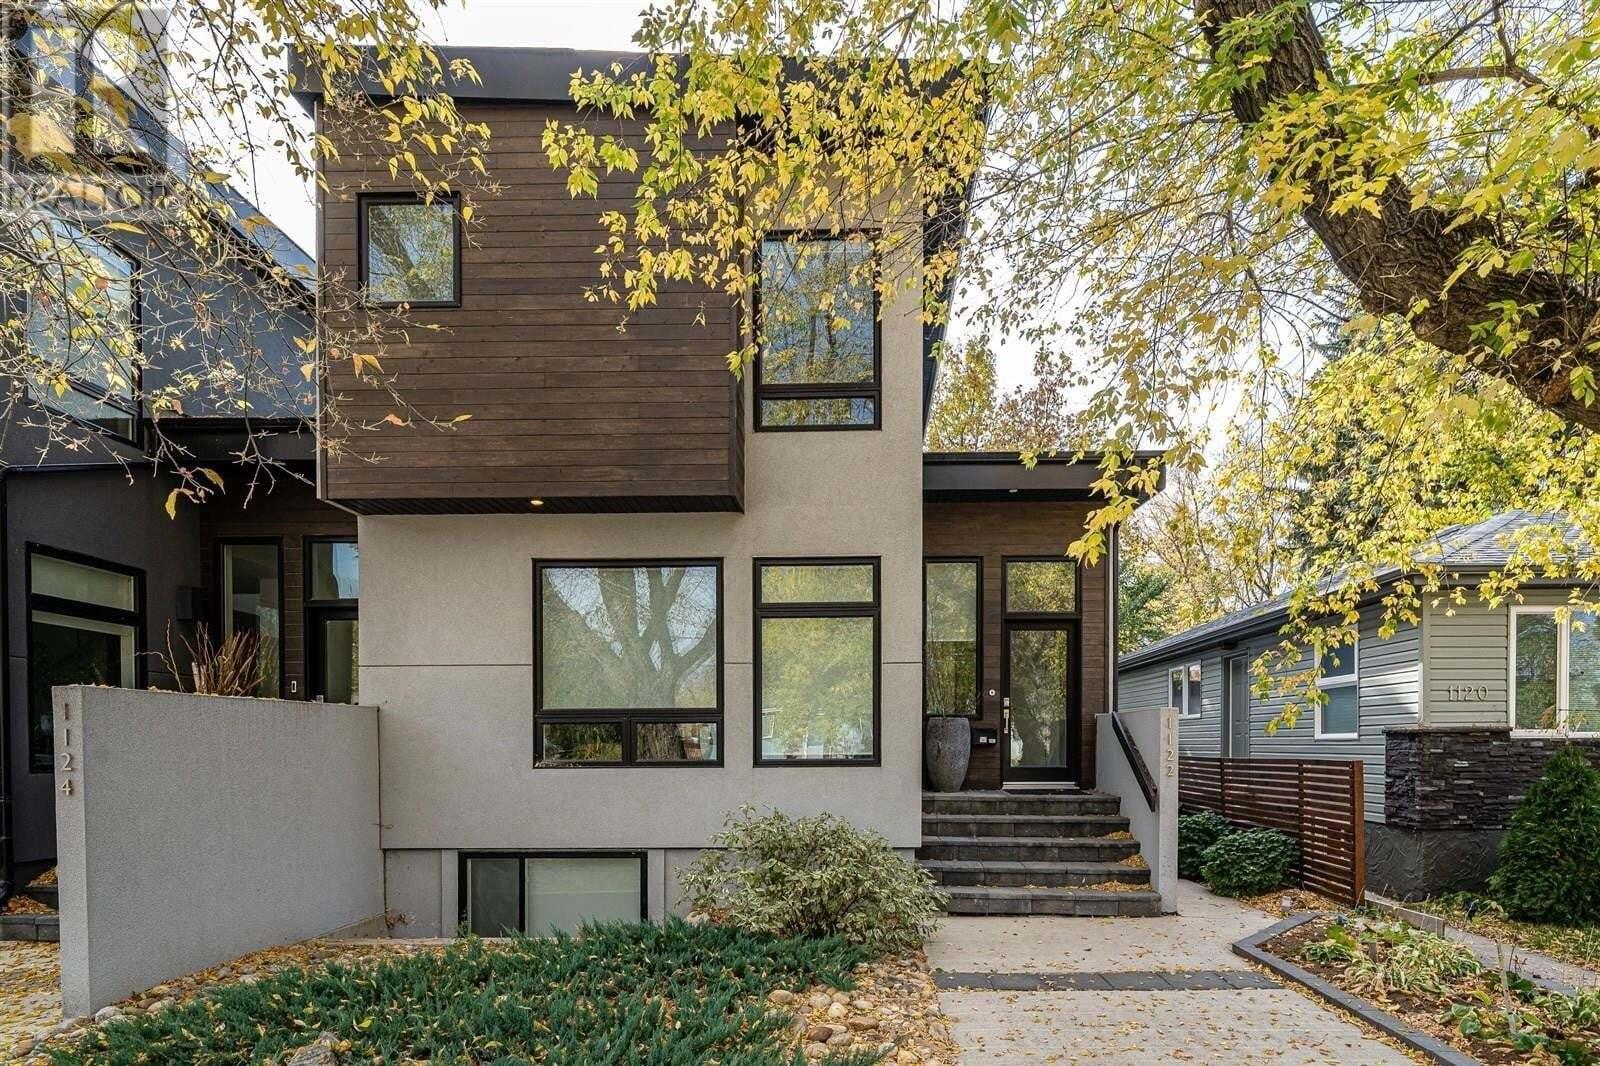 House for sale at 1122 3rd St E Saskatoon Saskatchewan - MLS: SK828166